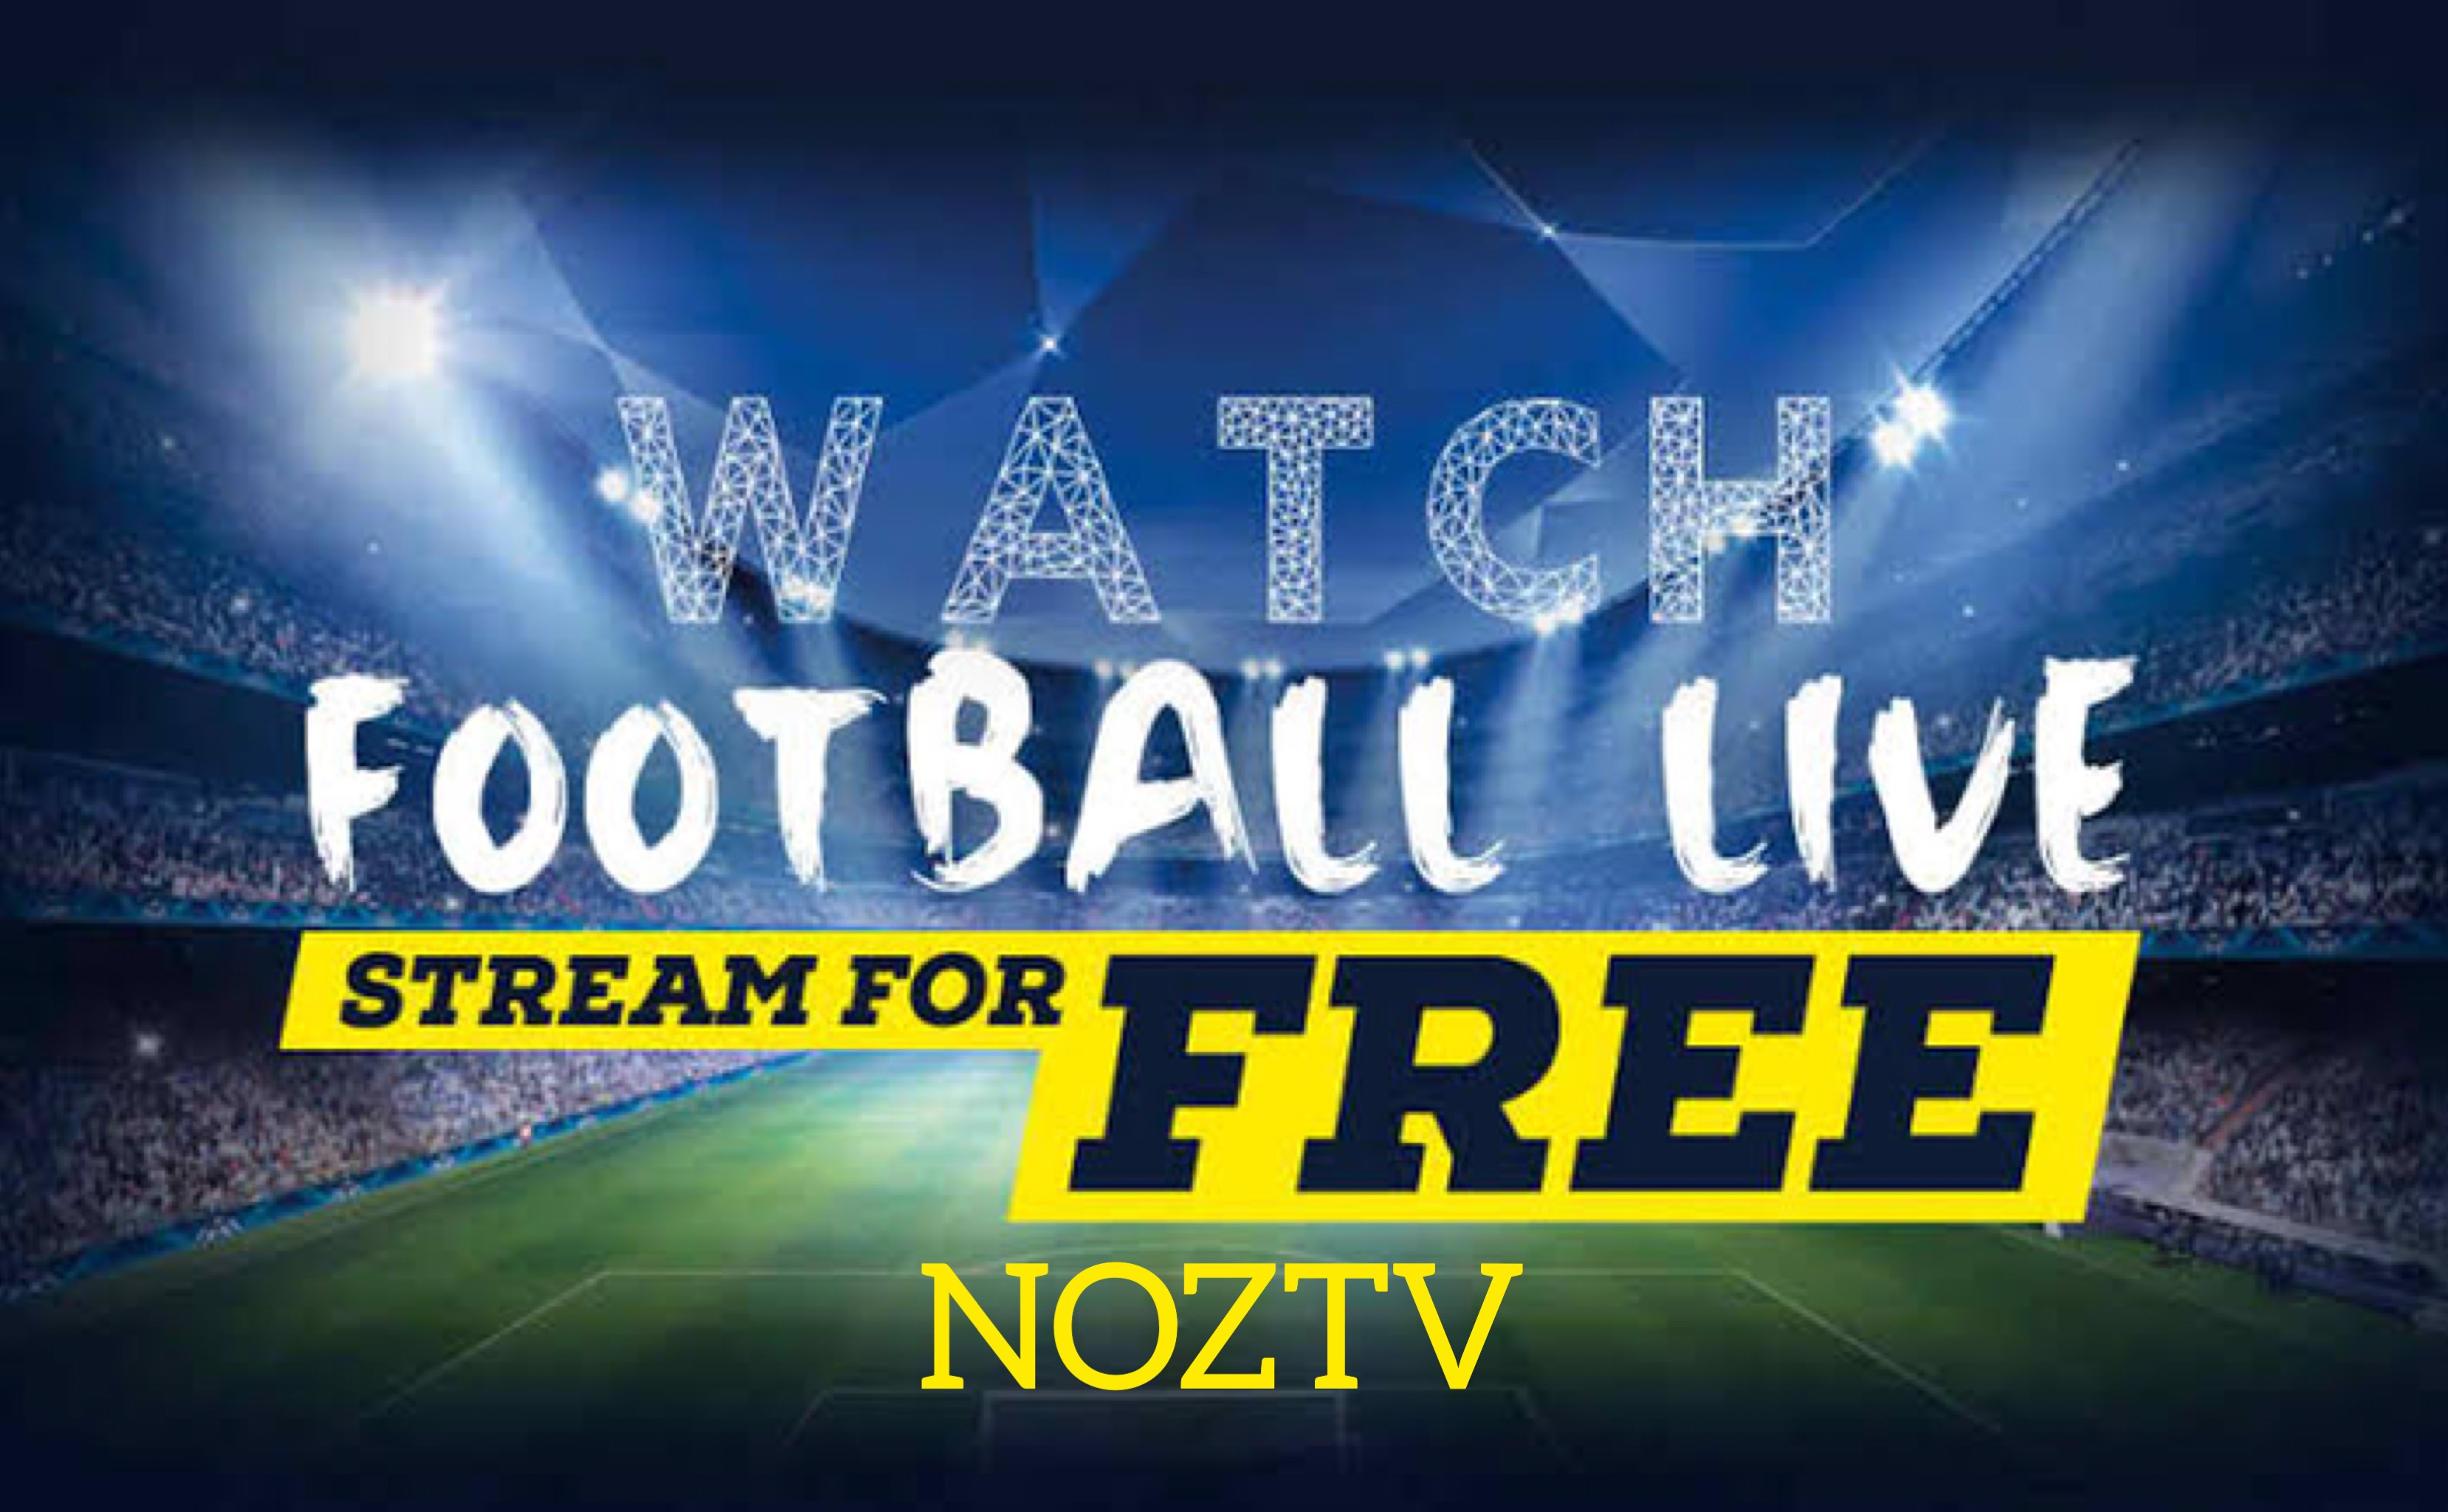 Nonton tv bersama di NozTv